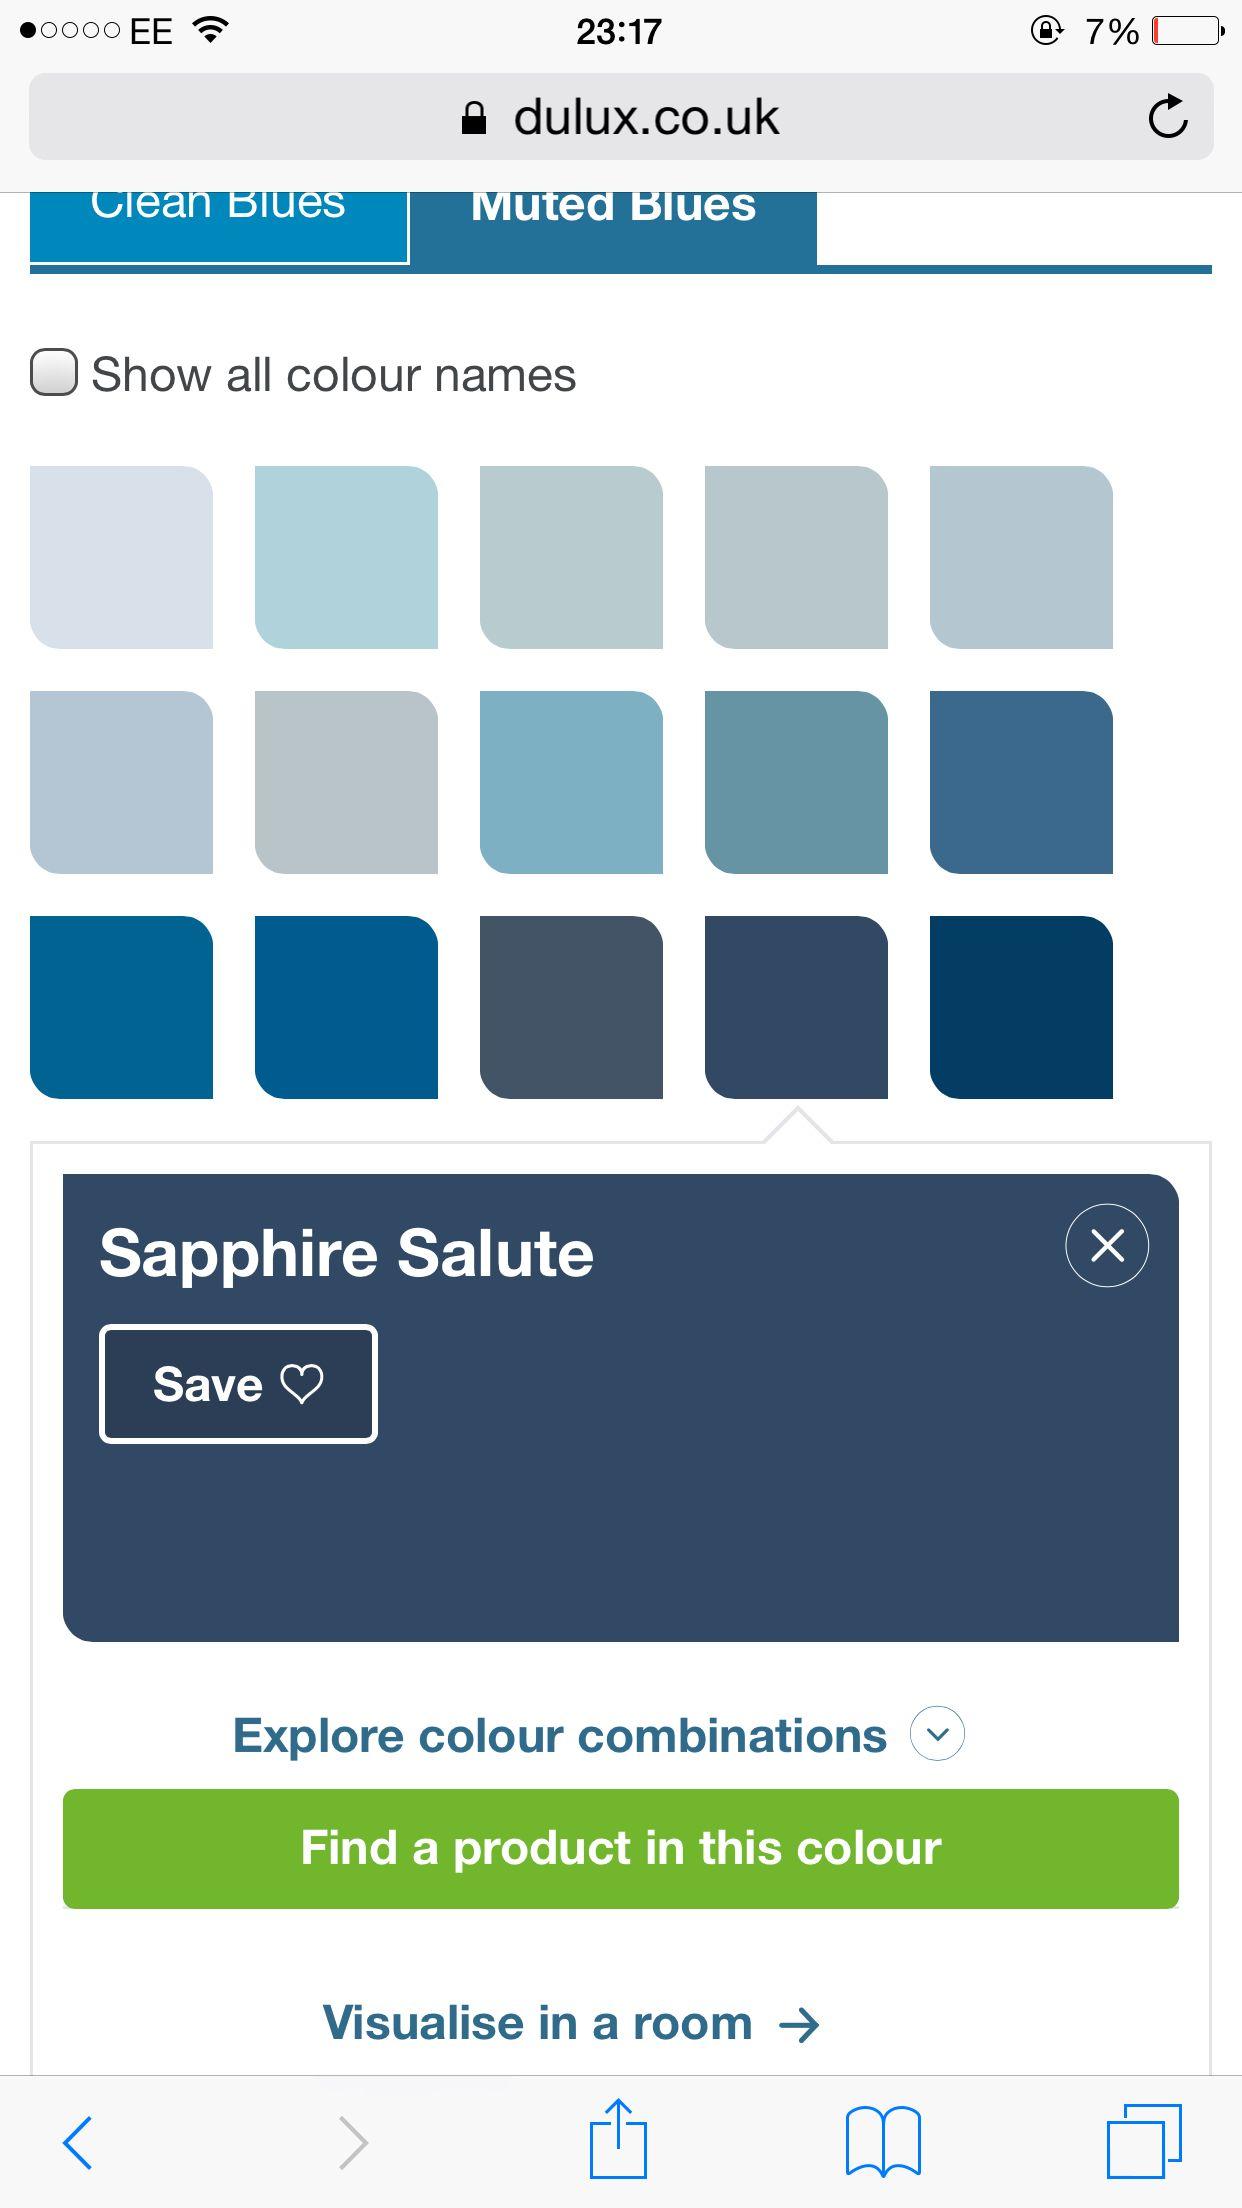 Sapphire Blue Navy Blue Dulux Paint Blue Wall Colors Dark Blue Paint Dulux Blue Paint